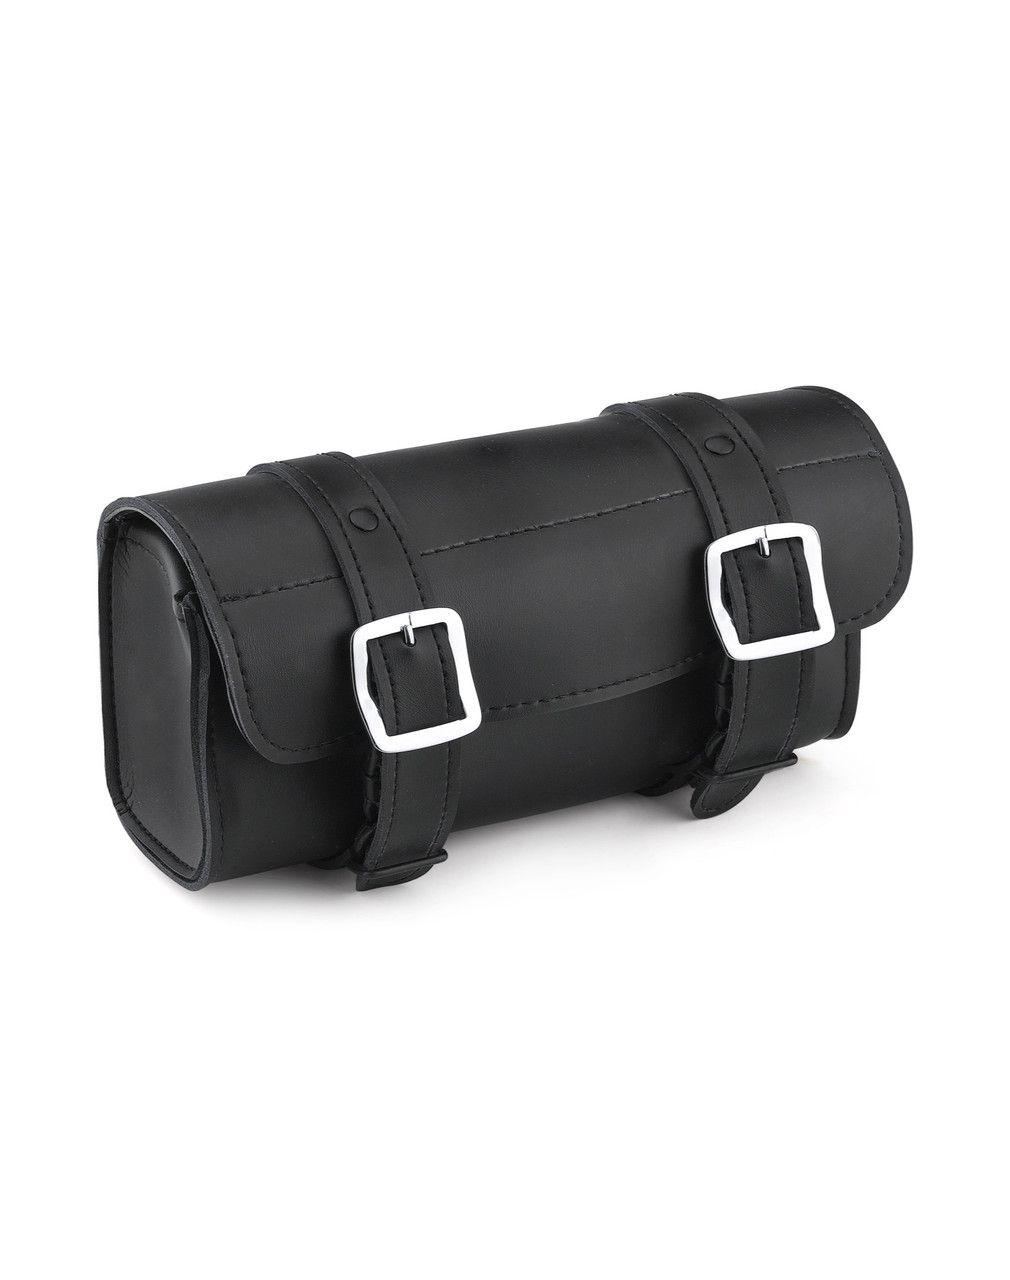 Suzuki Armor Plain Motorcycle Tool Bag Main Bag View